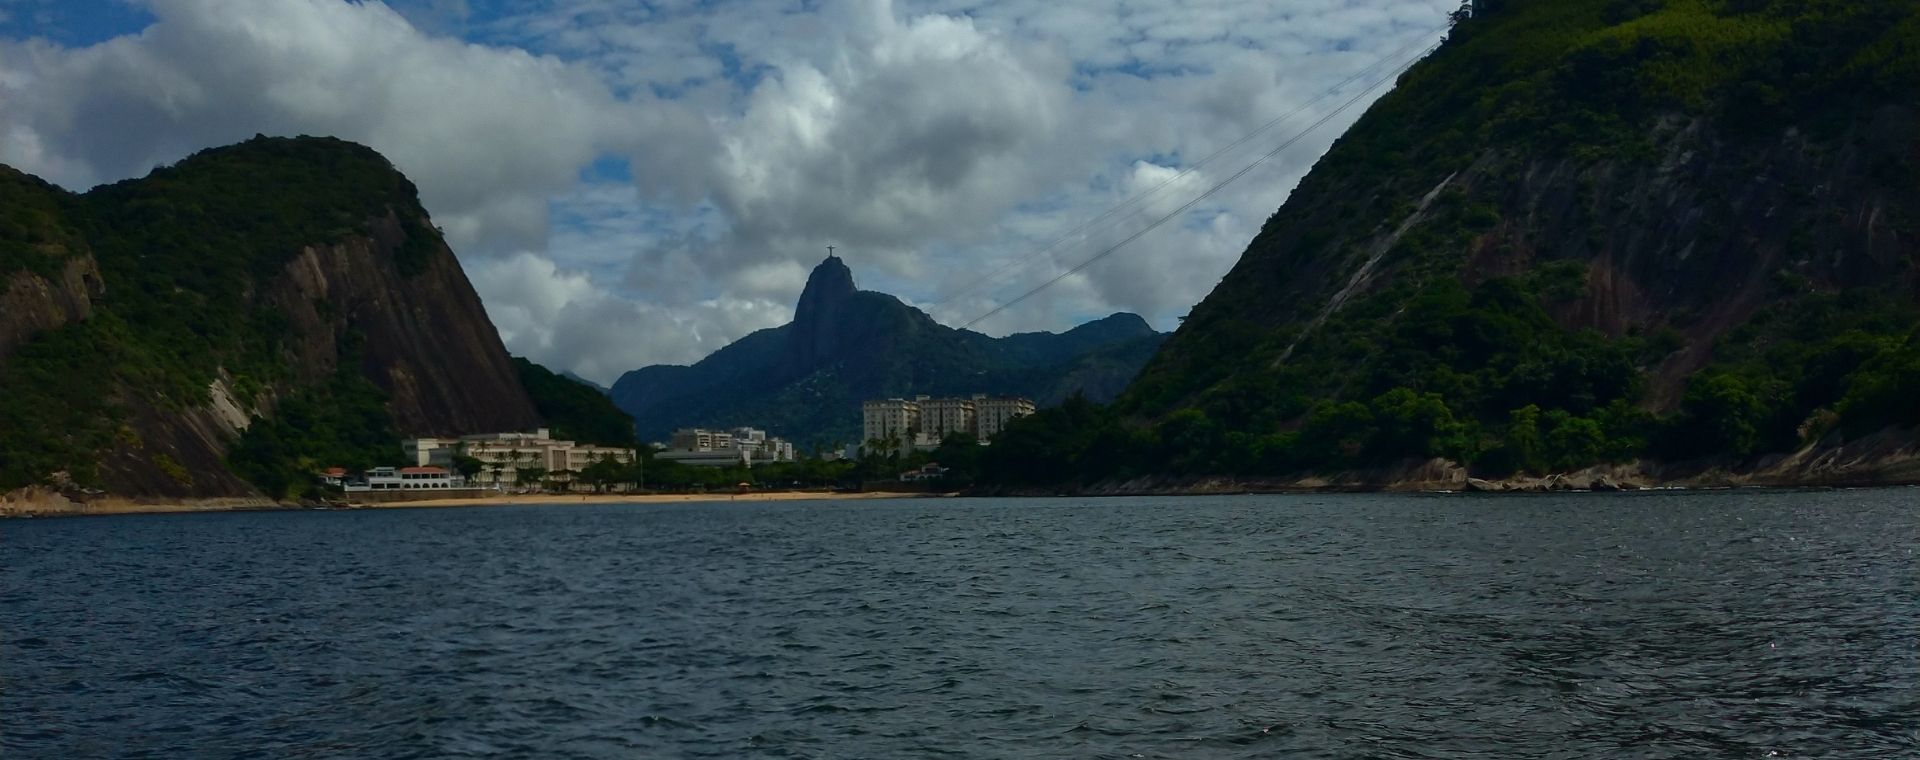 Passeio de Lancha no Rio